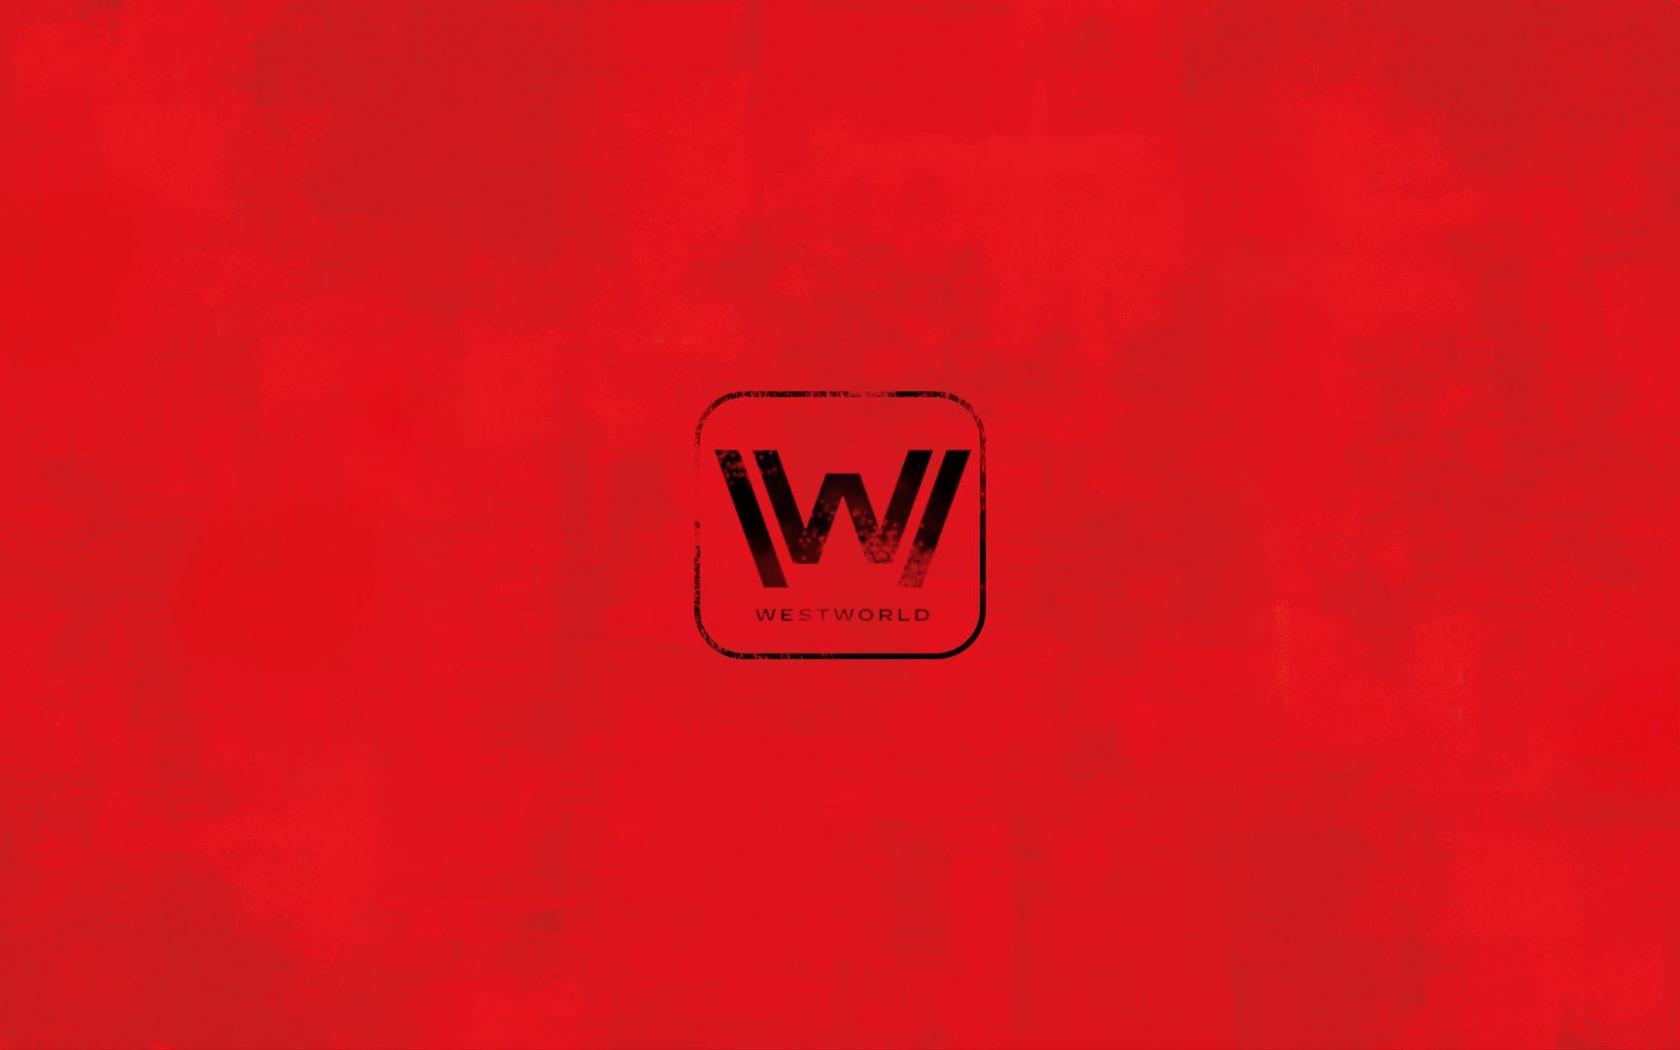 Download Westworld Wallpaper  Background